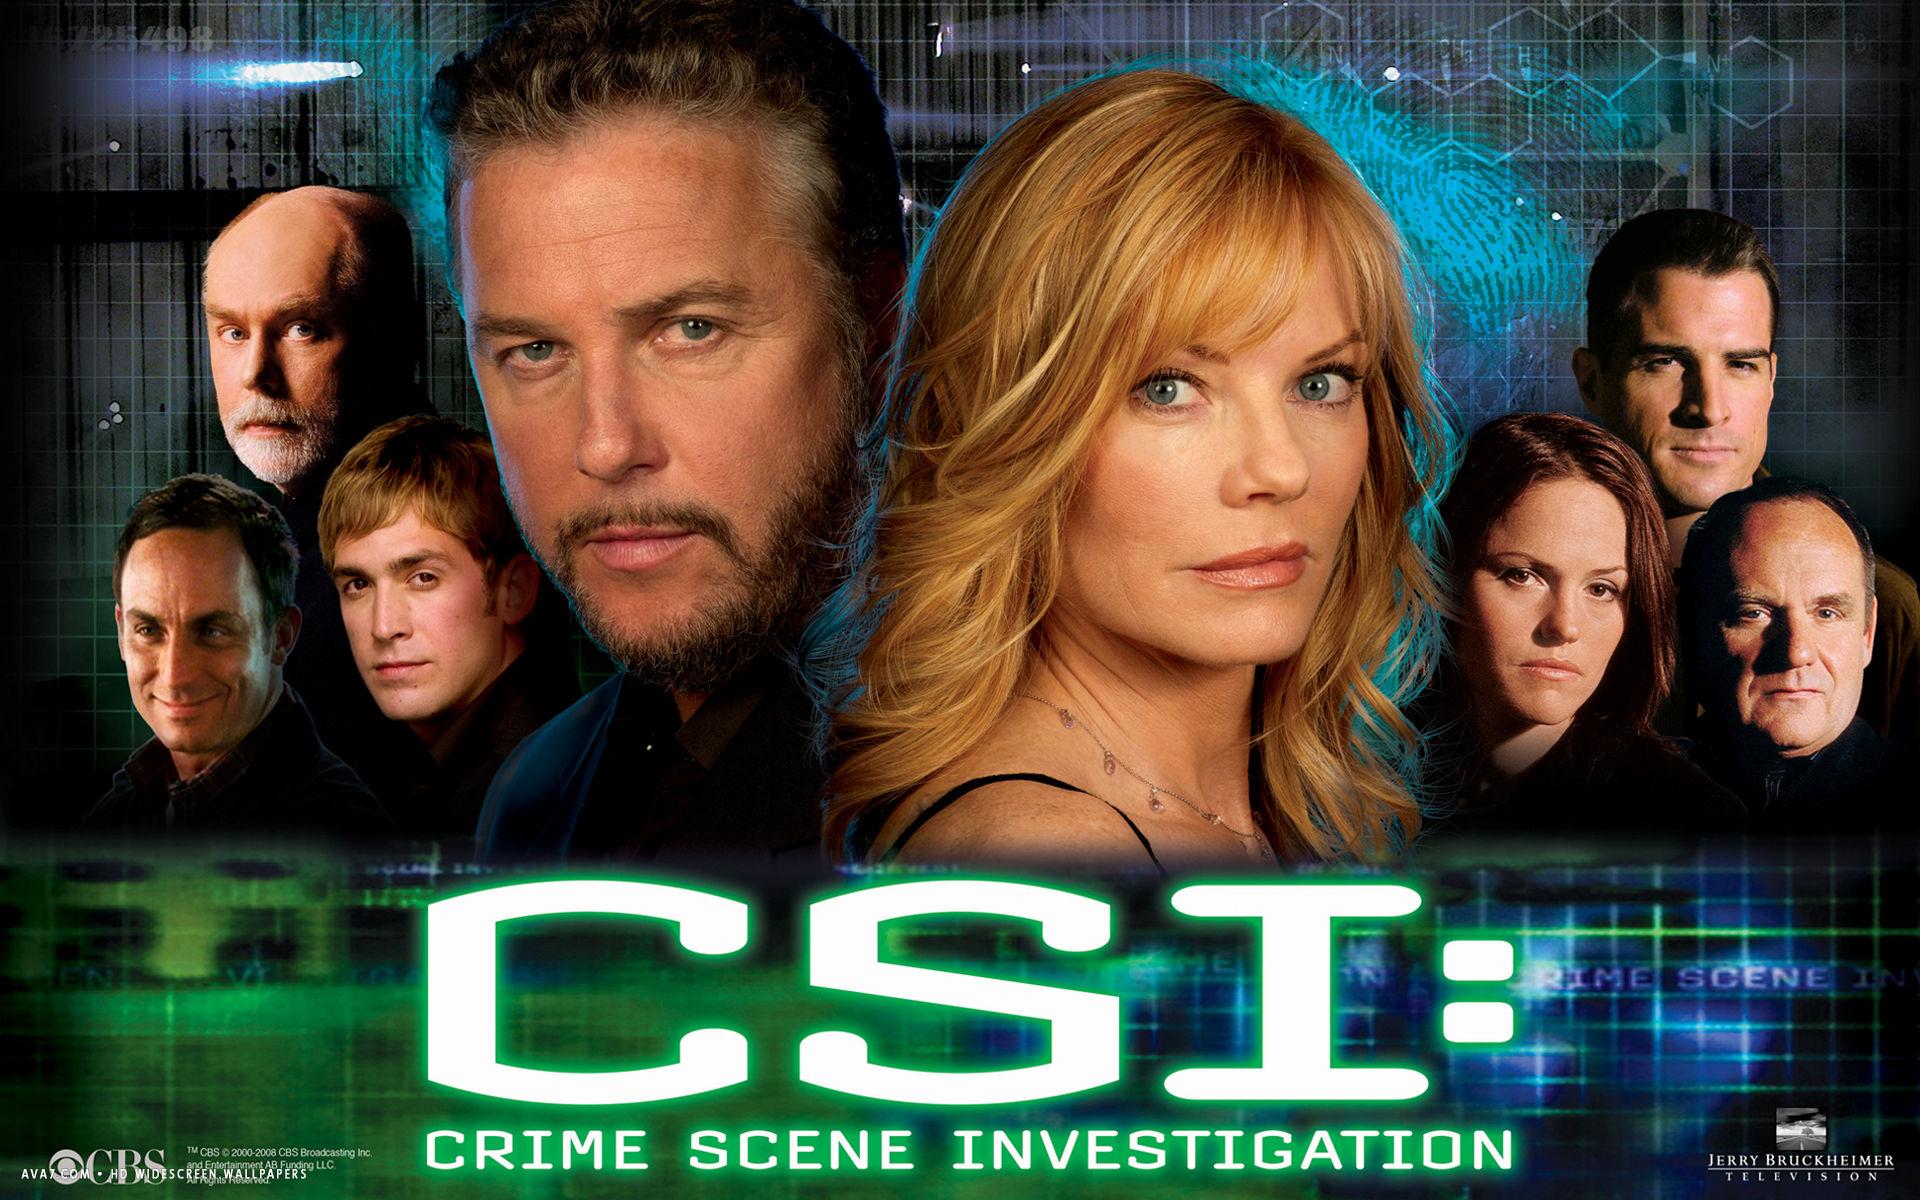 CSI: Crime Scene Investigation  Source: ava7.com